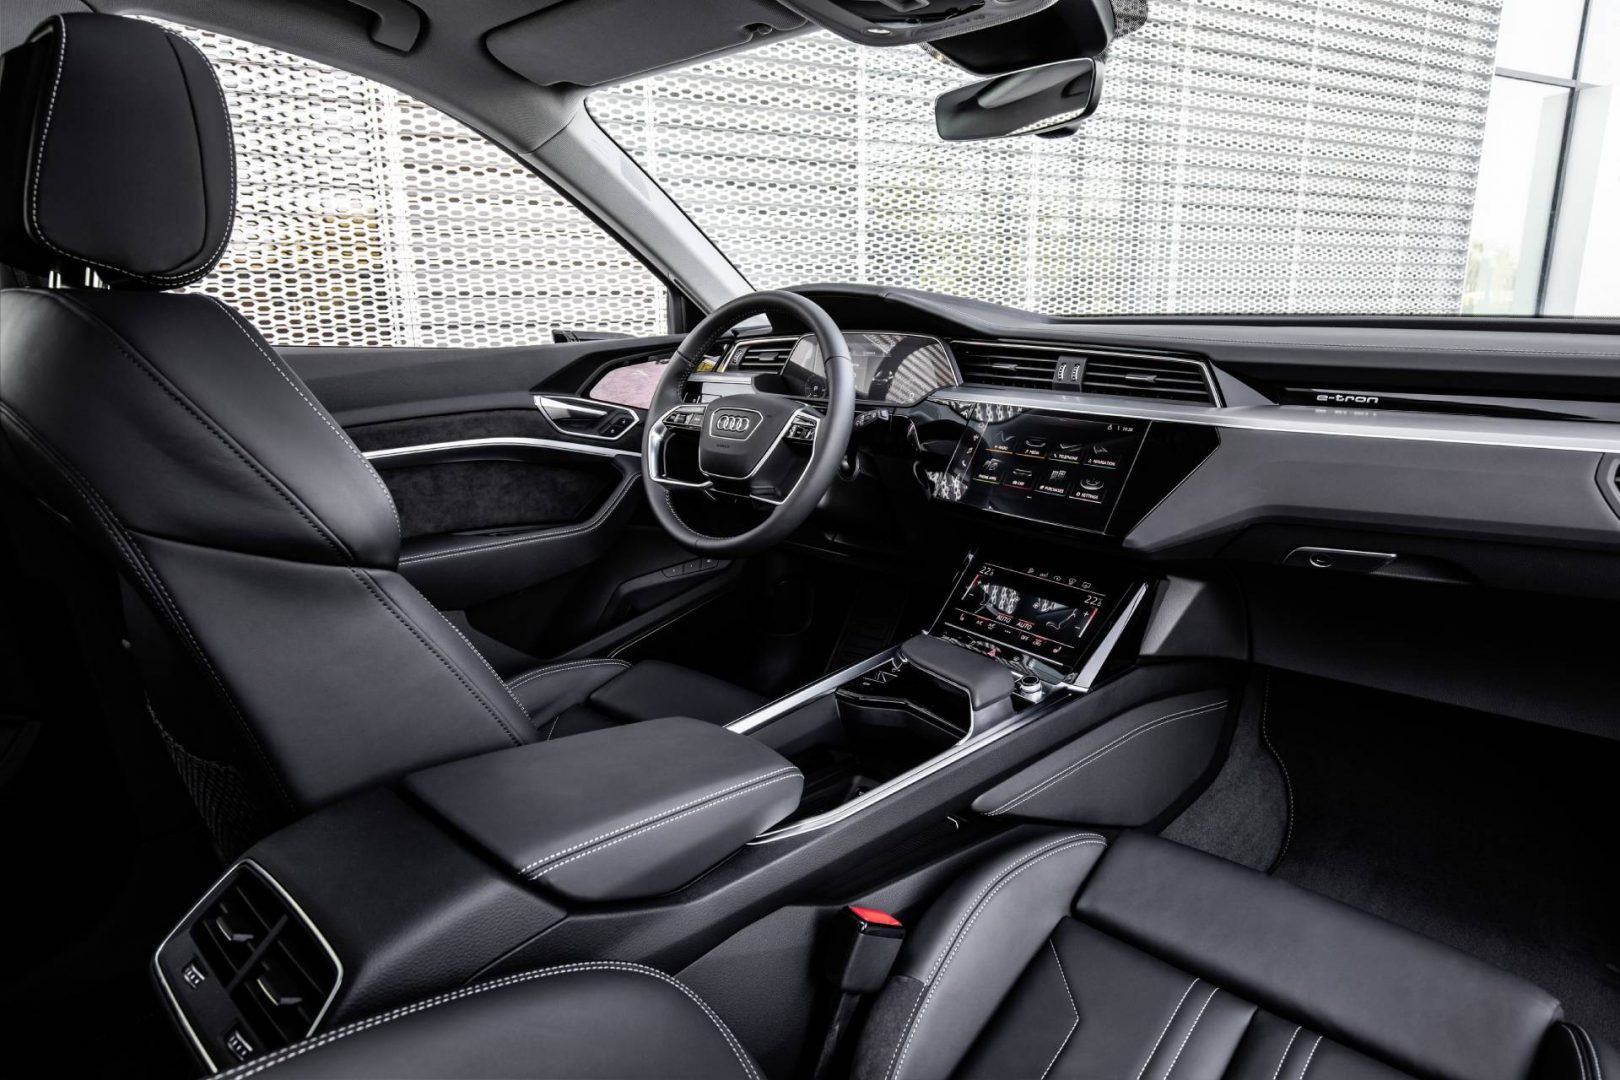 Audi e-tron interior front overview.